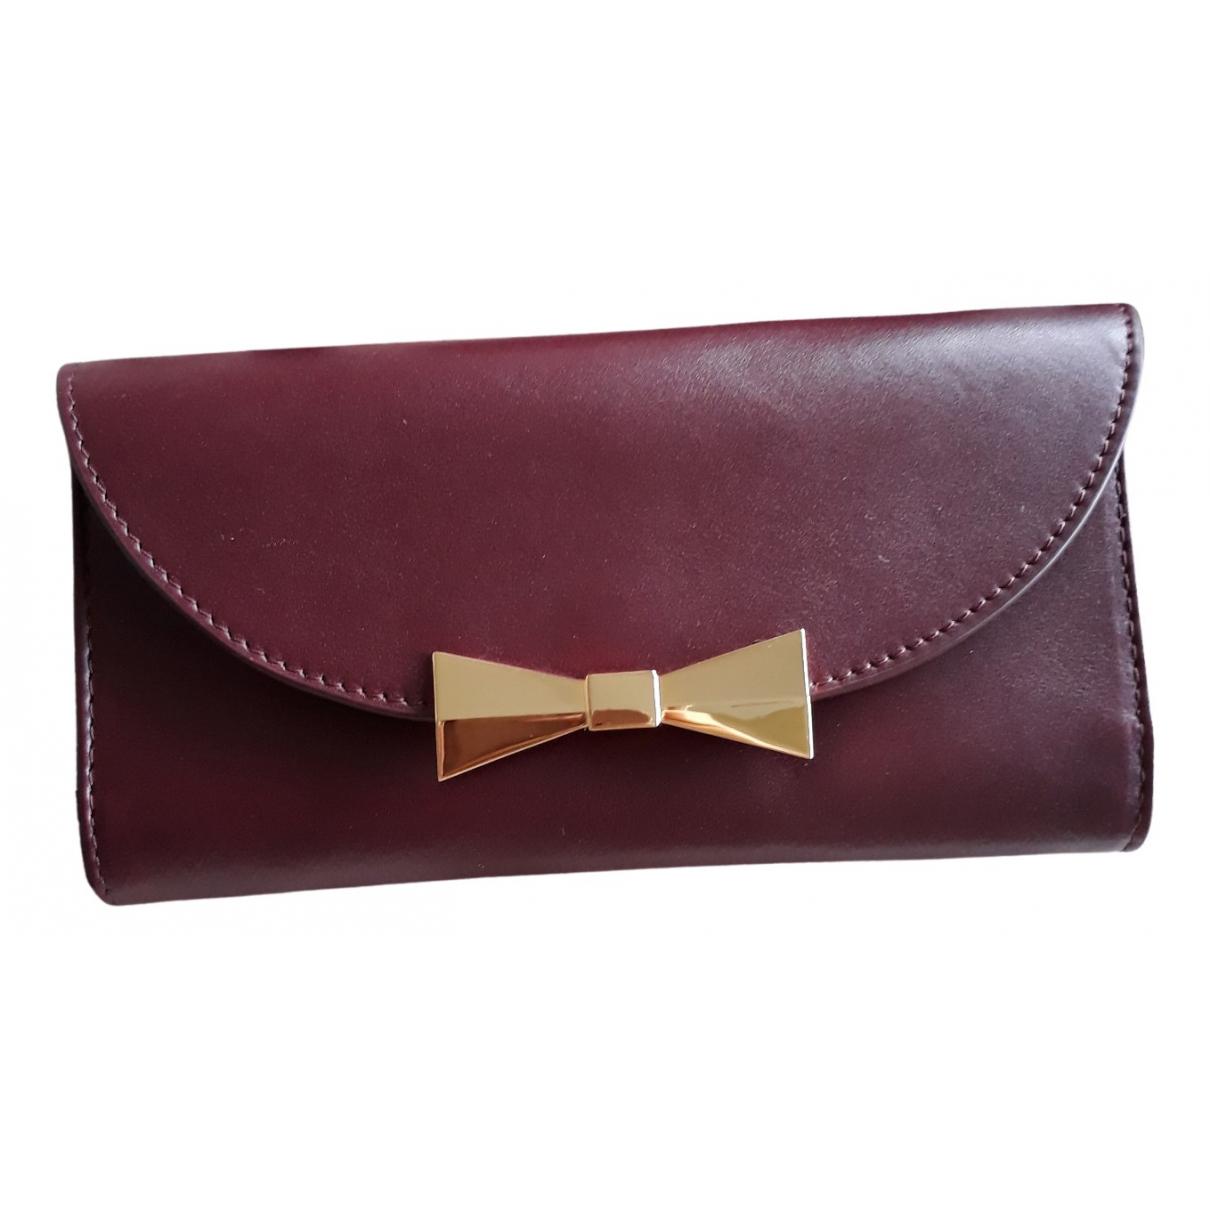 Des Petits Hauts \N Burgundy Leather wallet for Women \N